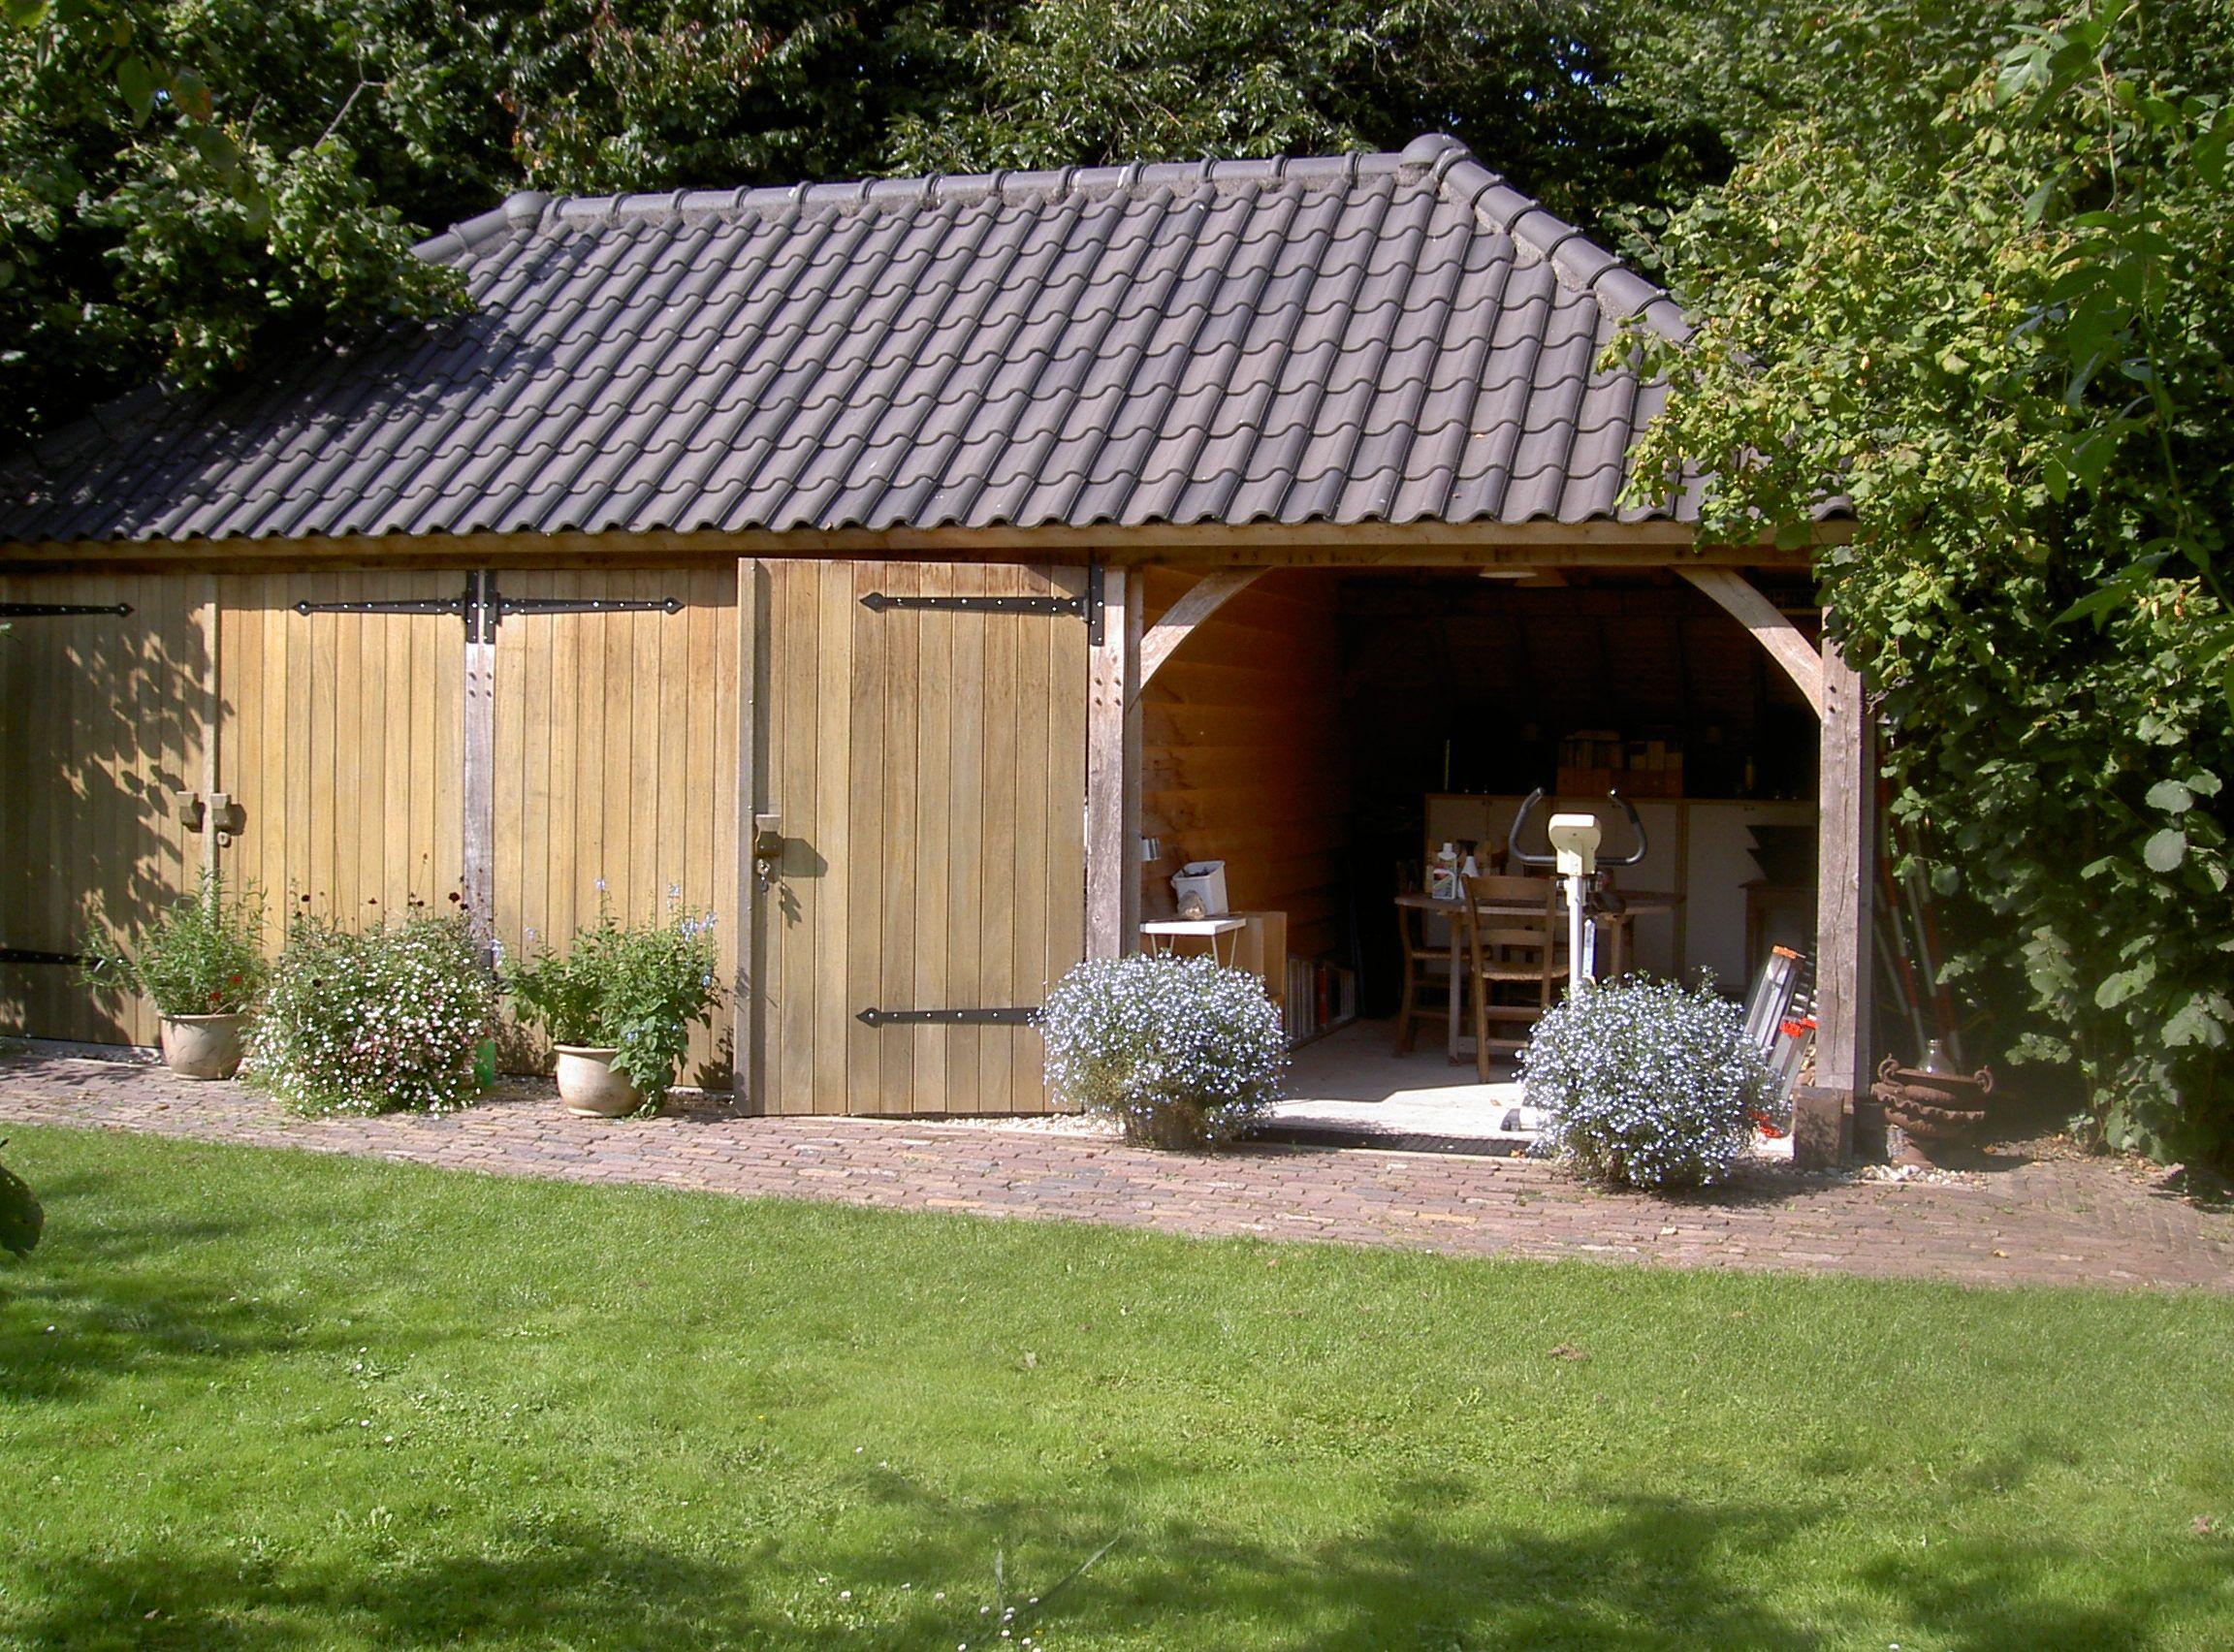 Eiken duurzaam eikenhout eikenhouten bijgebouw bijgebouwen atelier carport garage gastenverblijf - Ontwerp tuinhuis ...